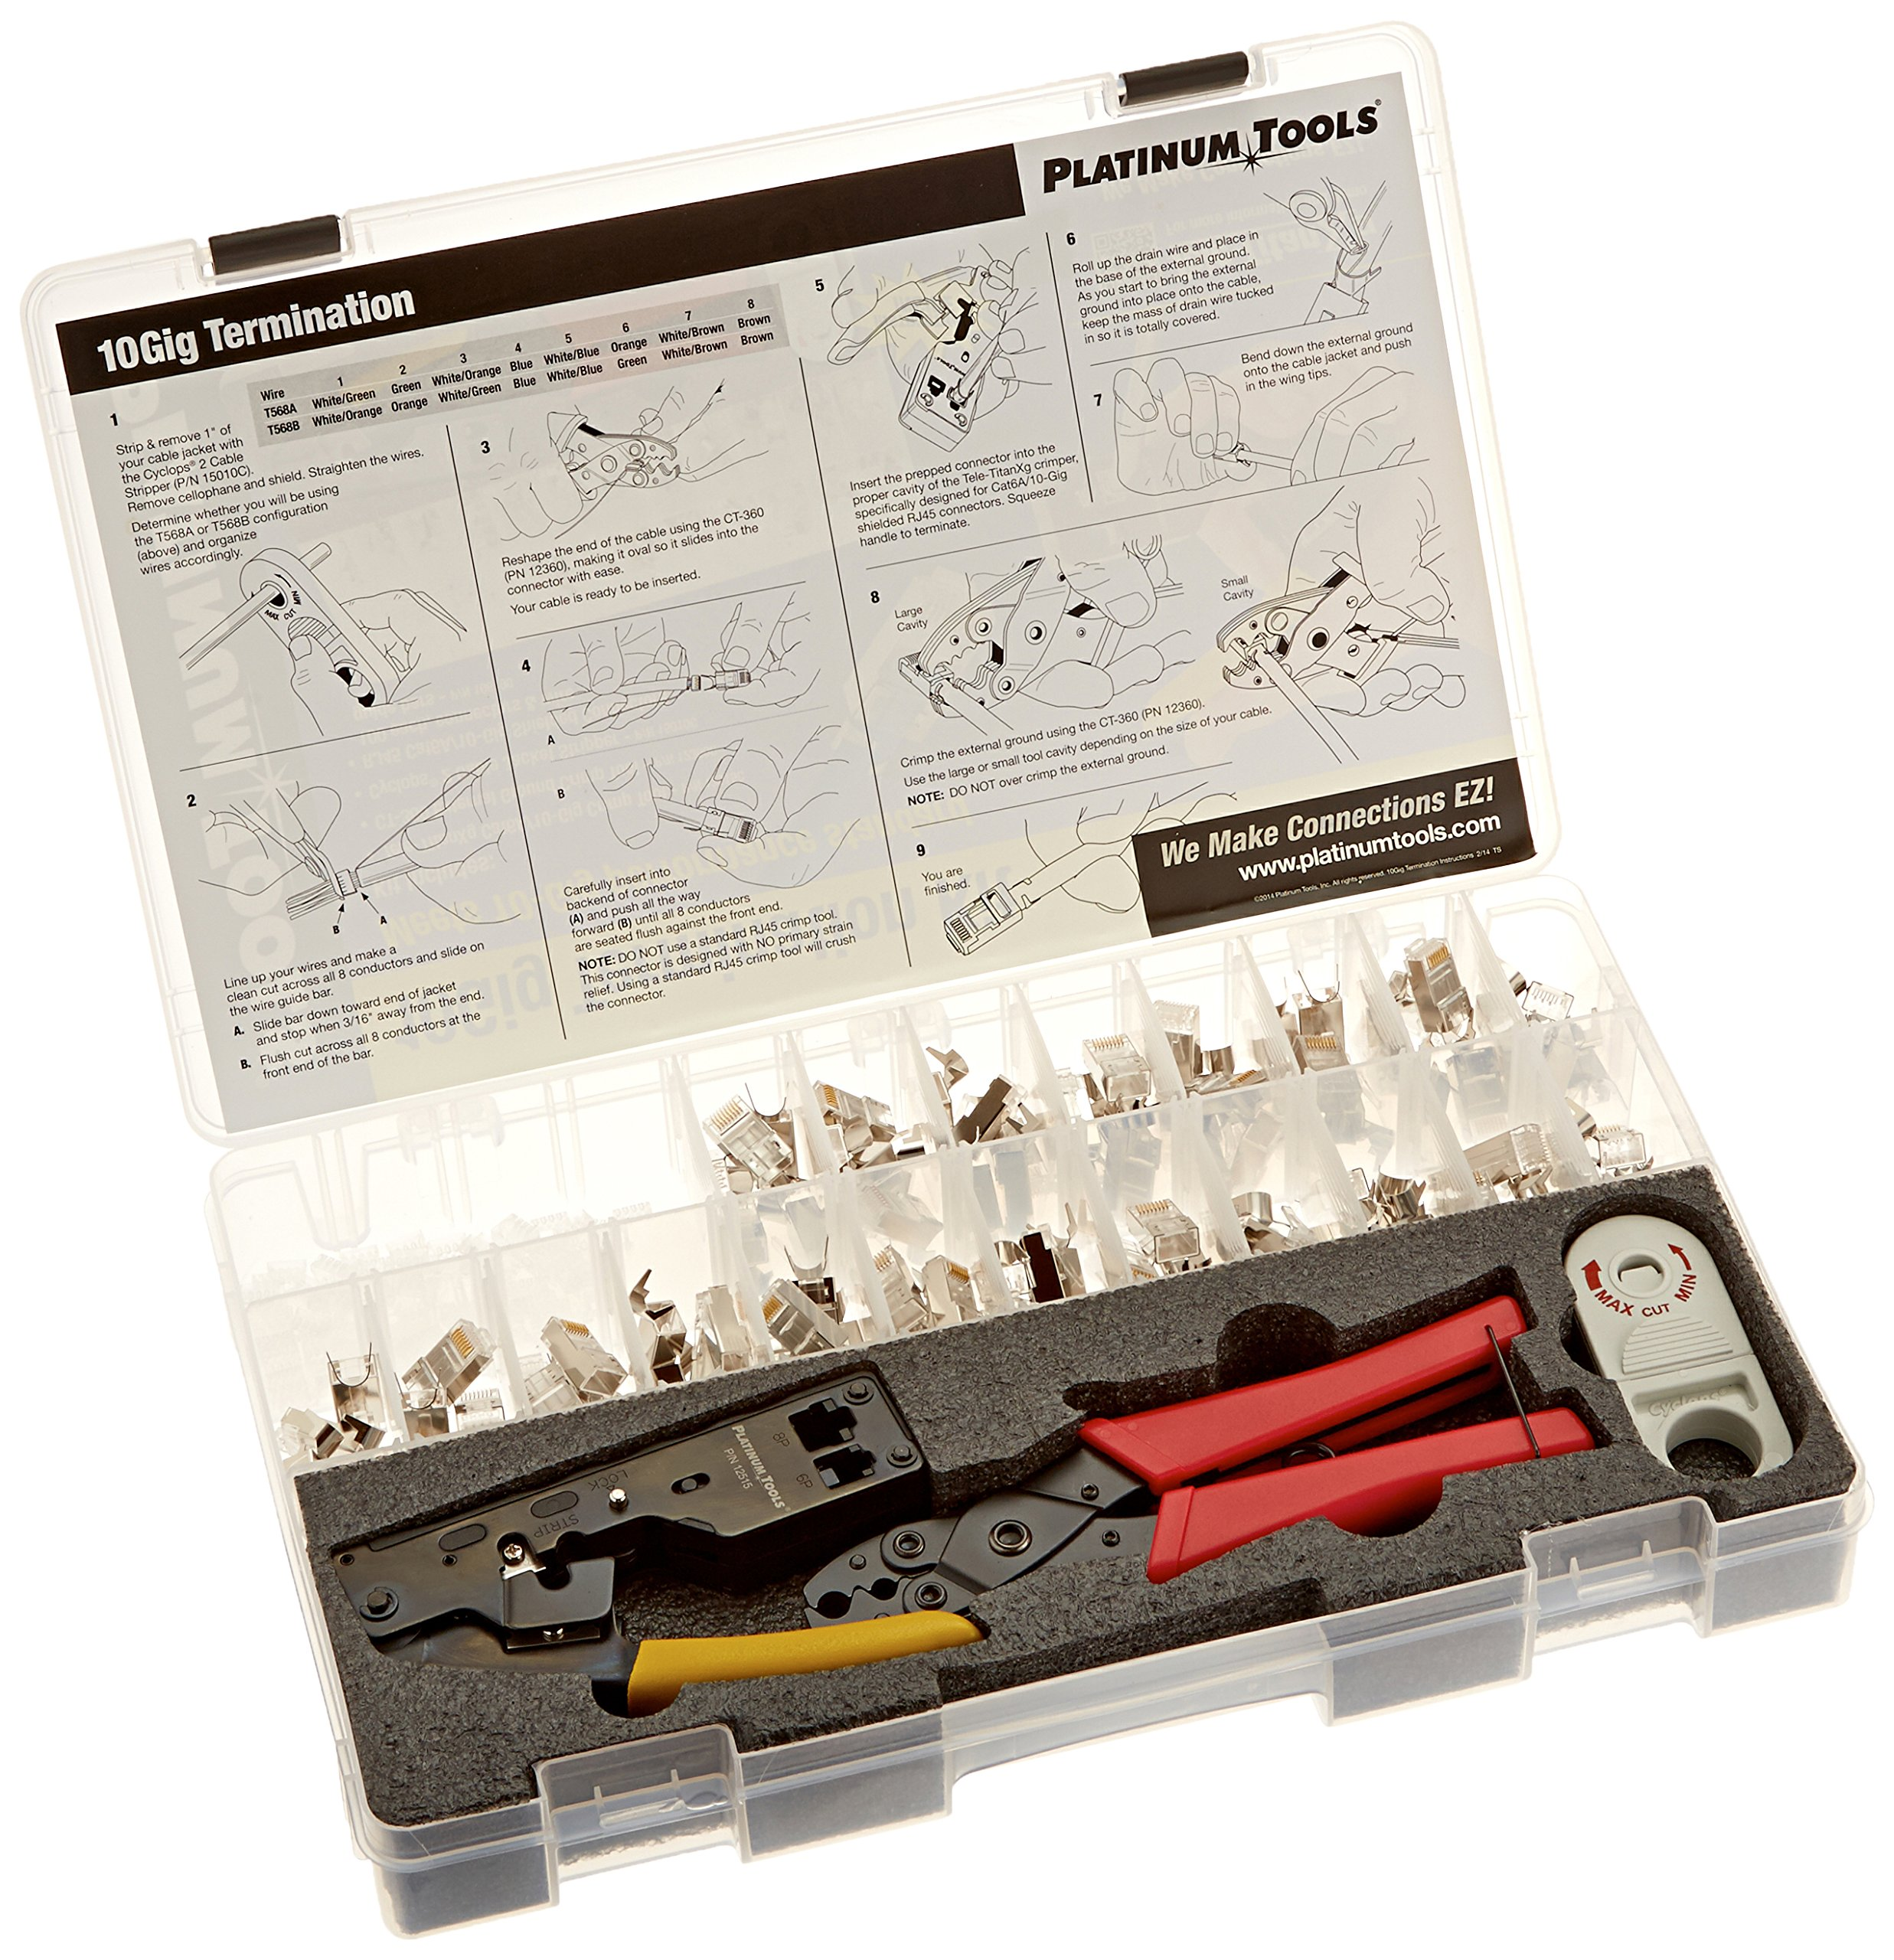 Platinum Tools 90170 10Gig Termination Kit. Box.